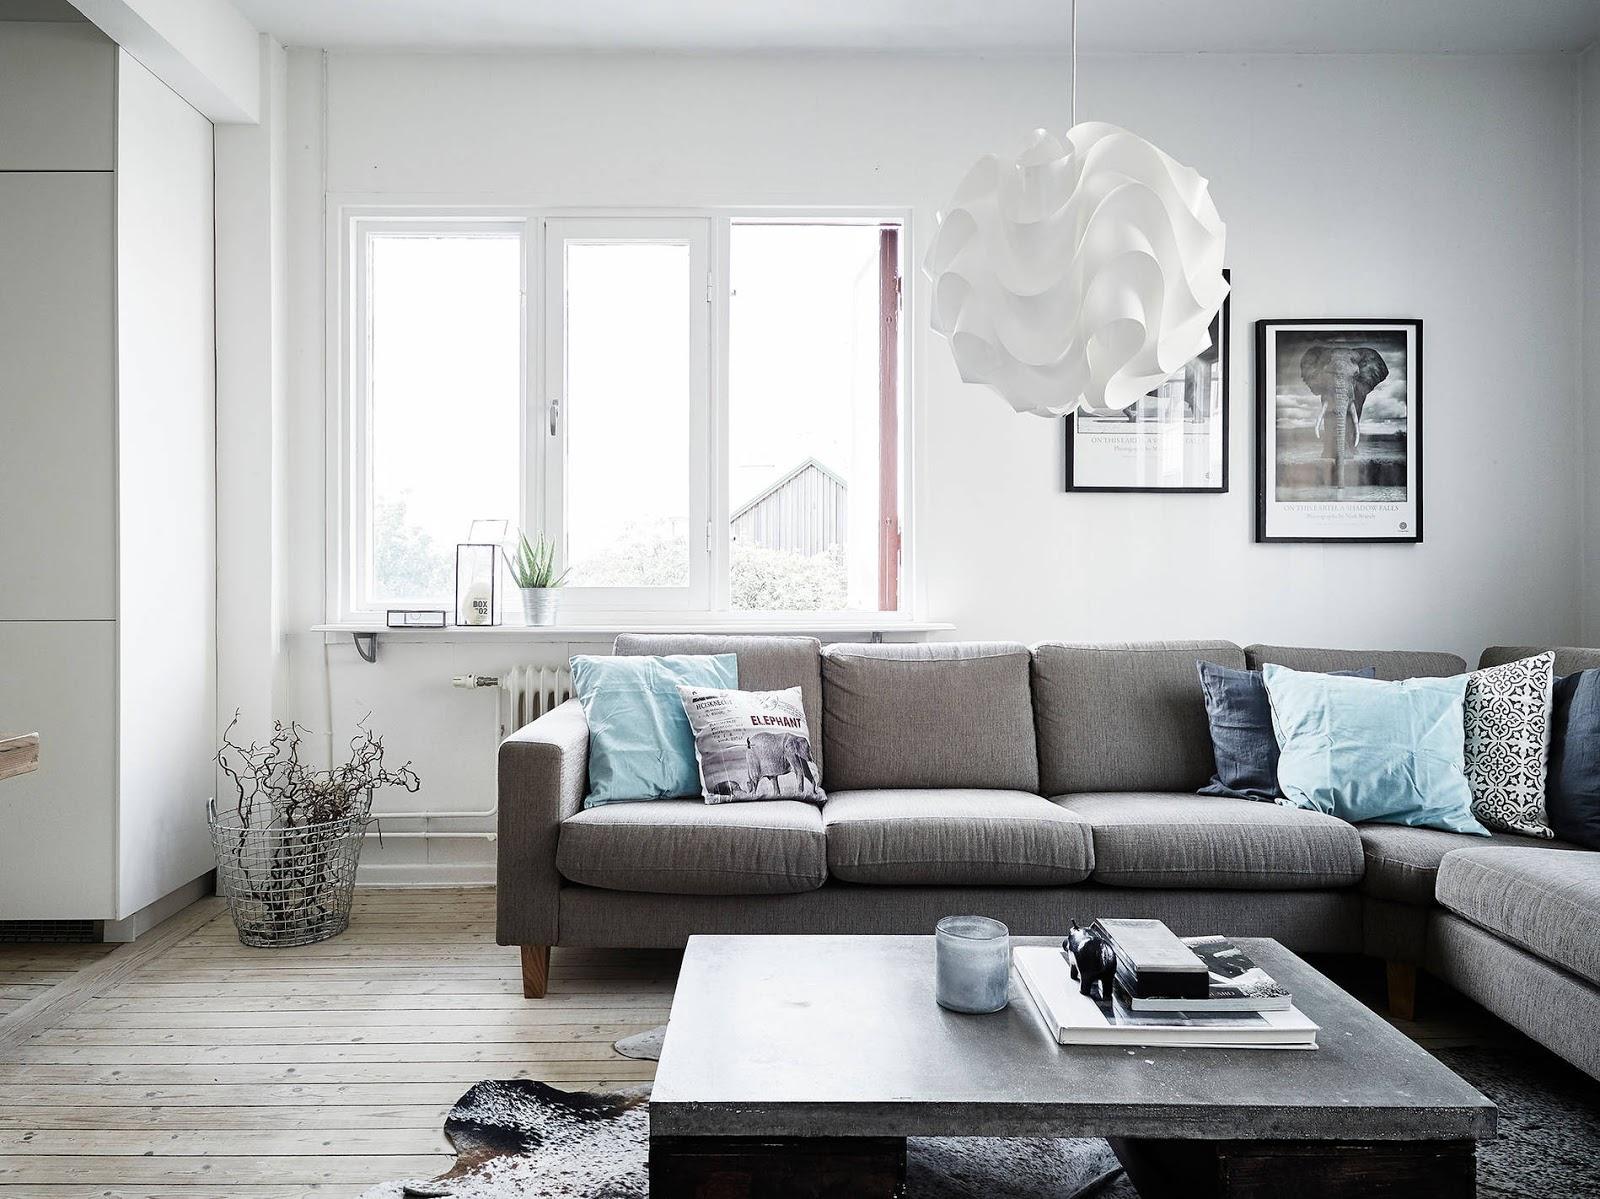 szara kanapa, szara rogówka, szara sofa IKEA